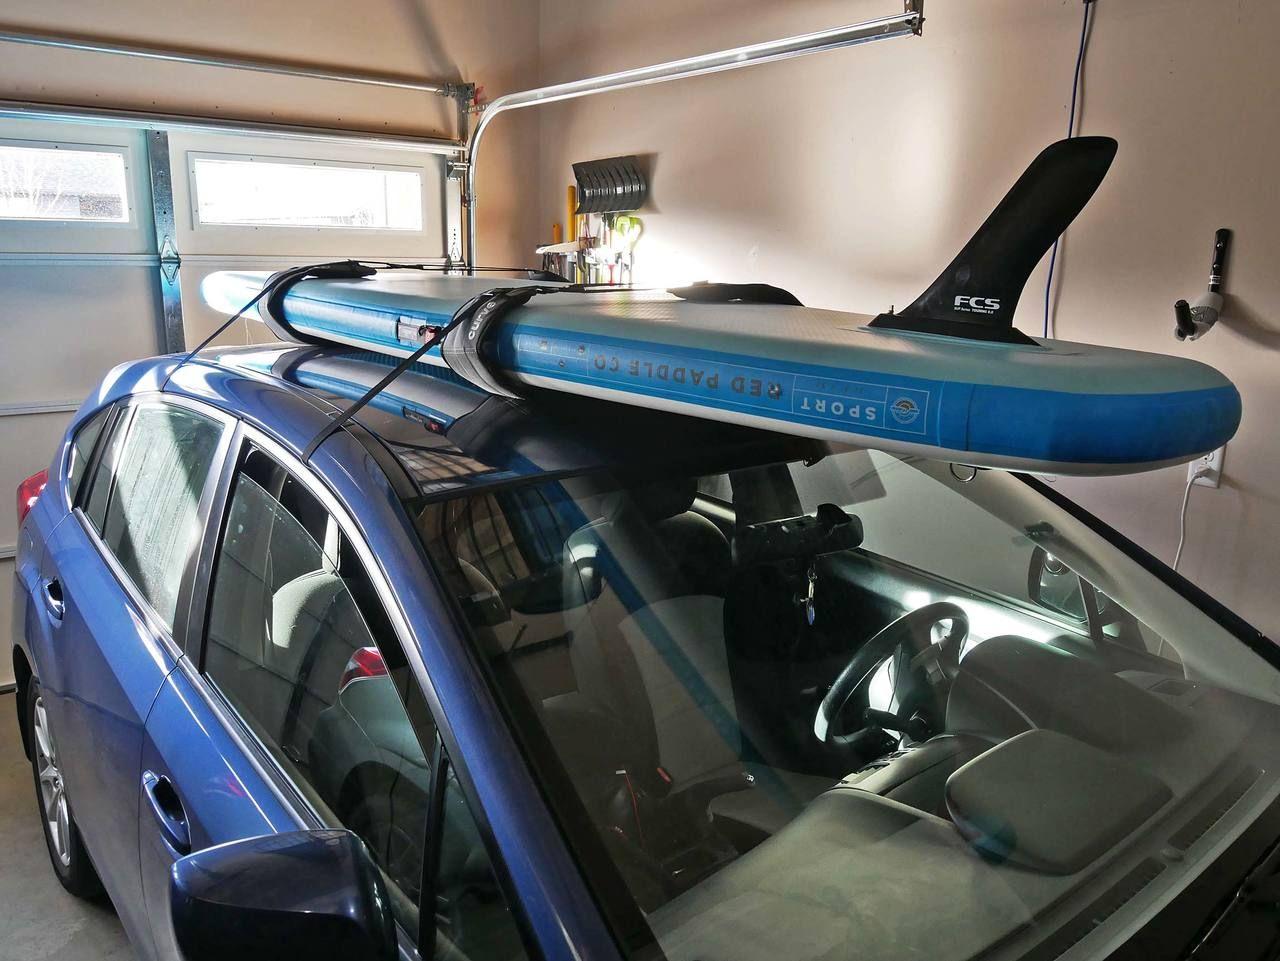 Sup Roof Racks 2 Paddleboard Car Rack Car Racks Kayak Storage